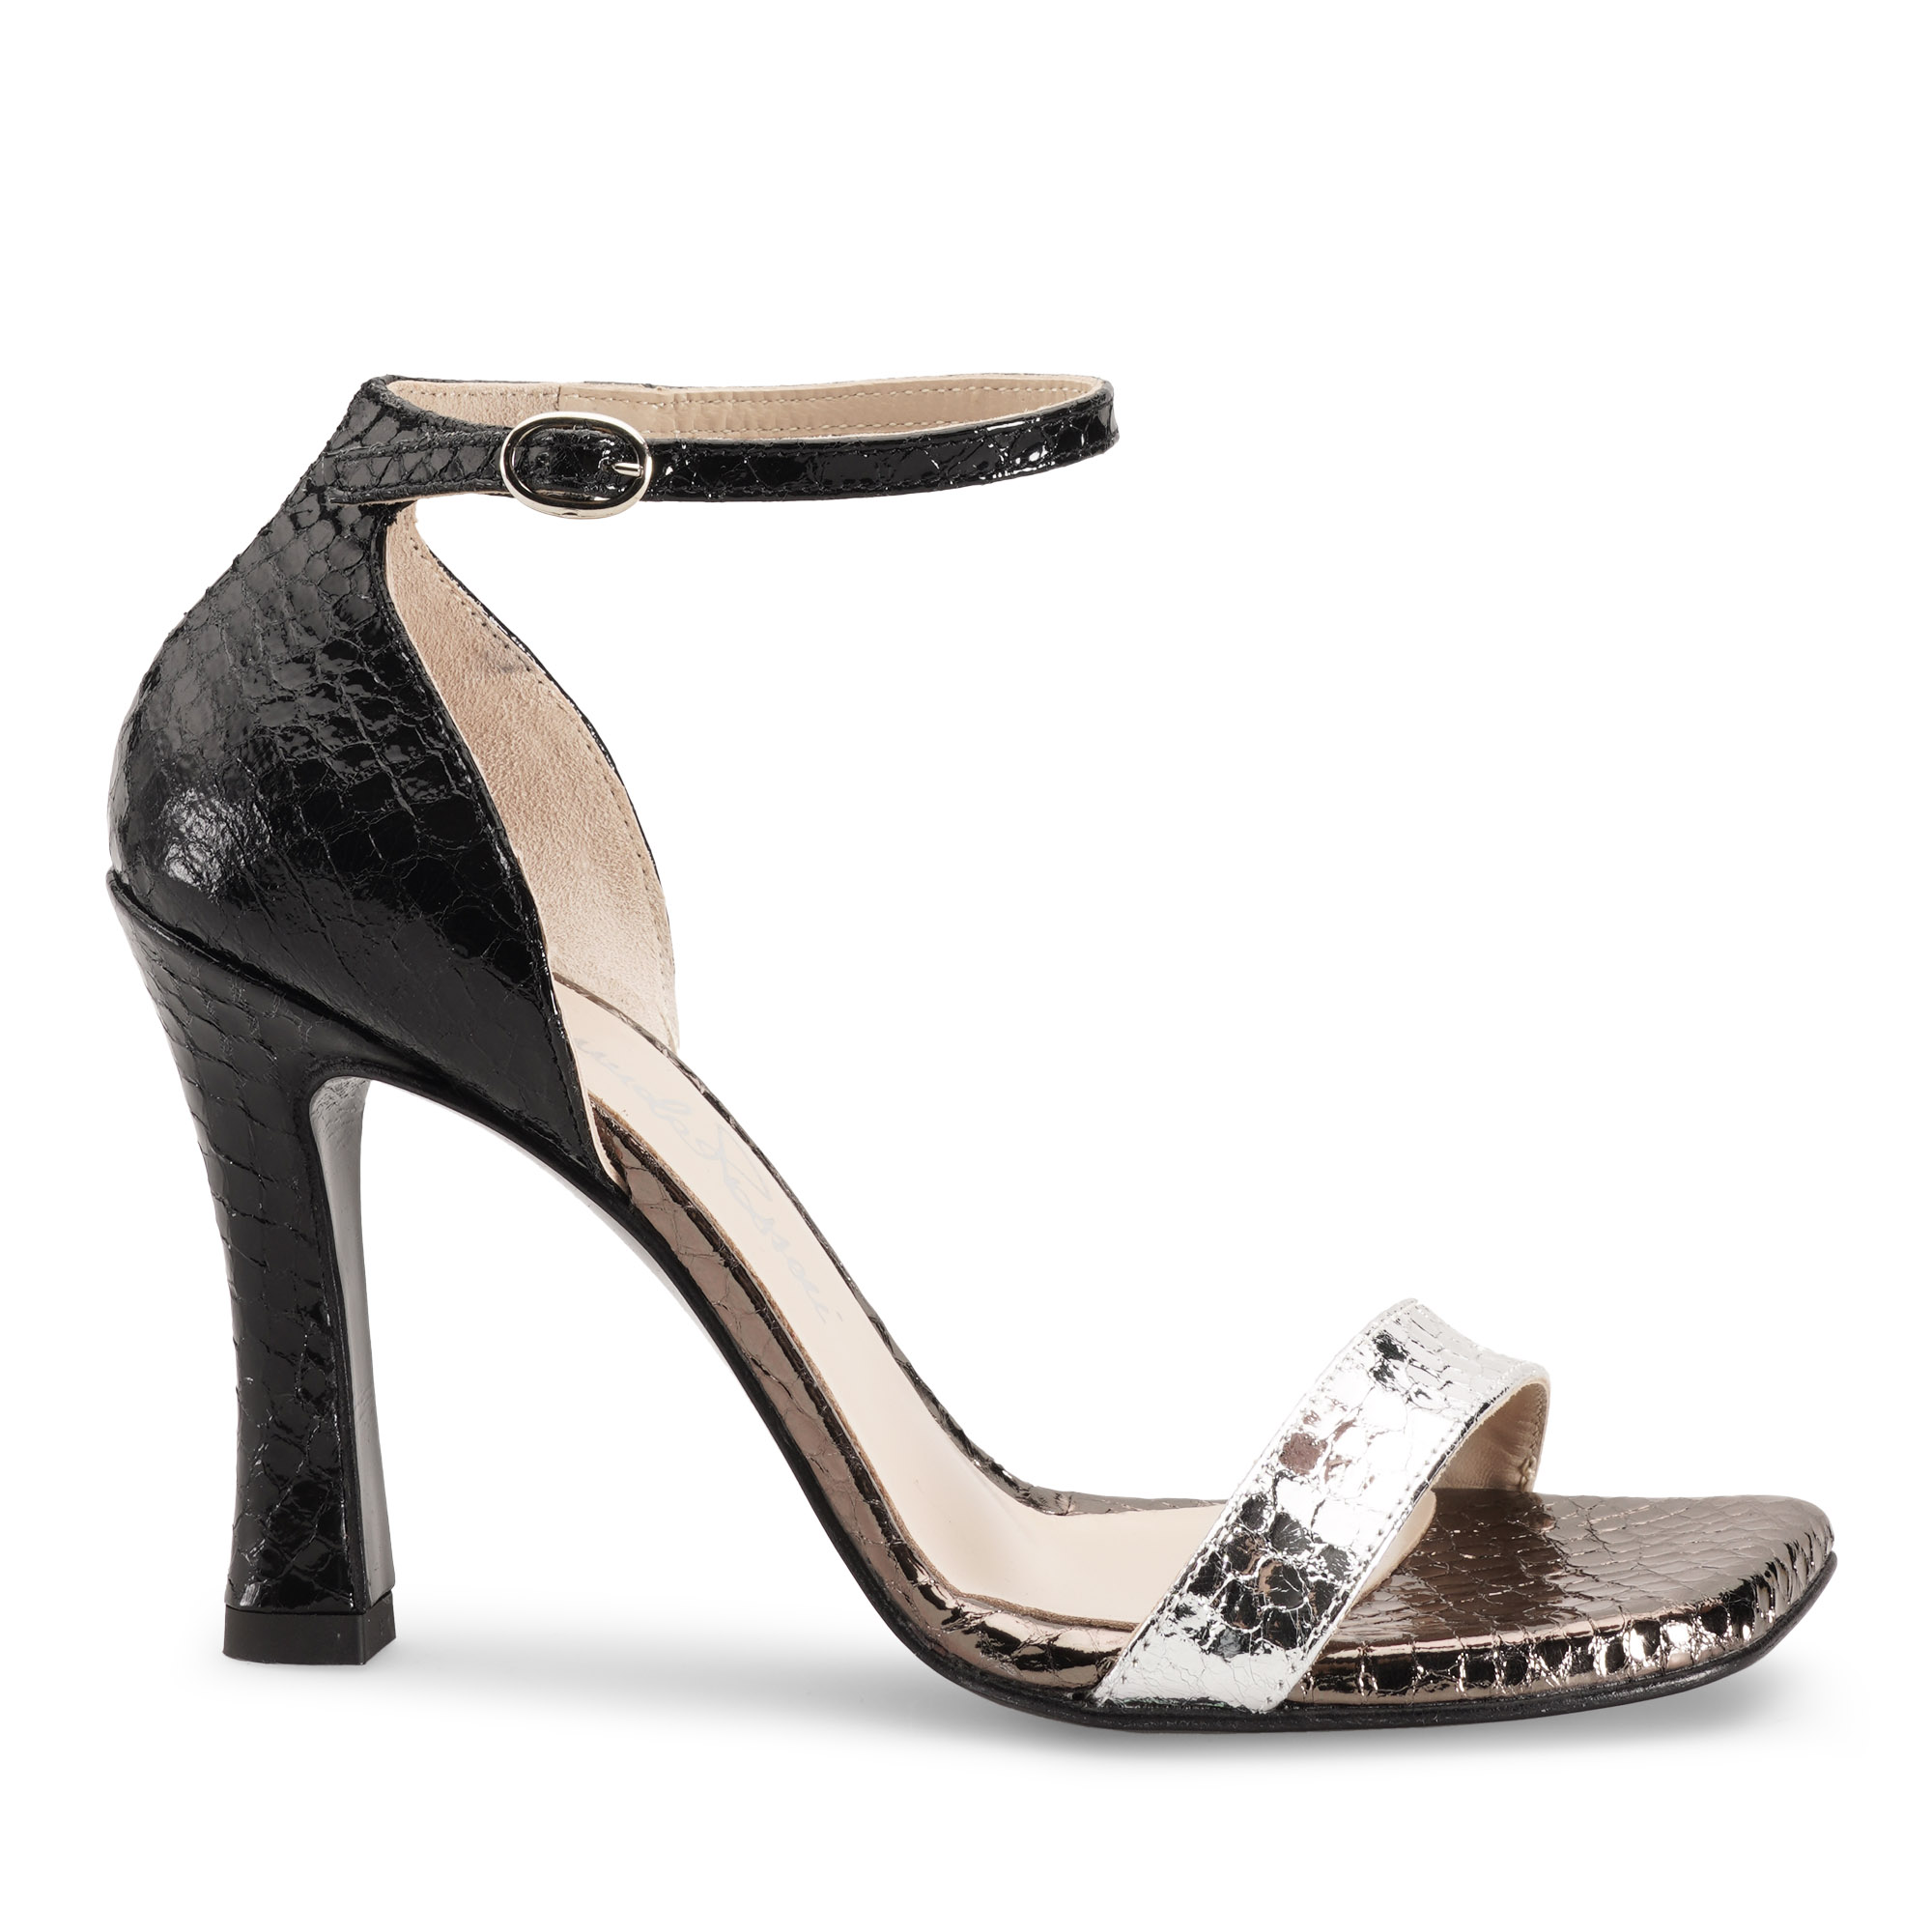 sandalo-donna-laminato-pitone-nero-argento-emanuela-passeri-shoes-hells-spring-summer-2021